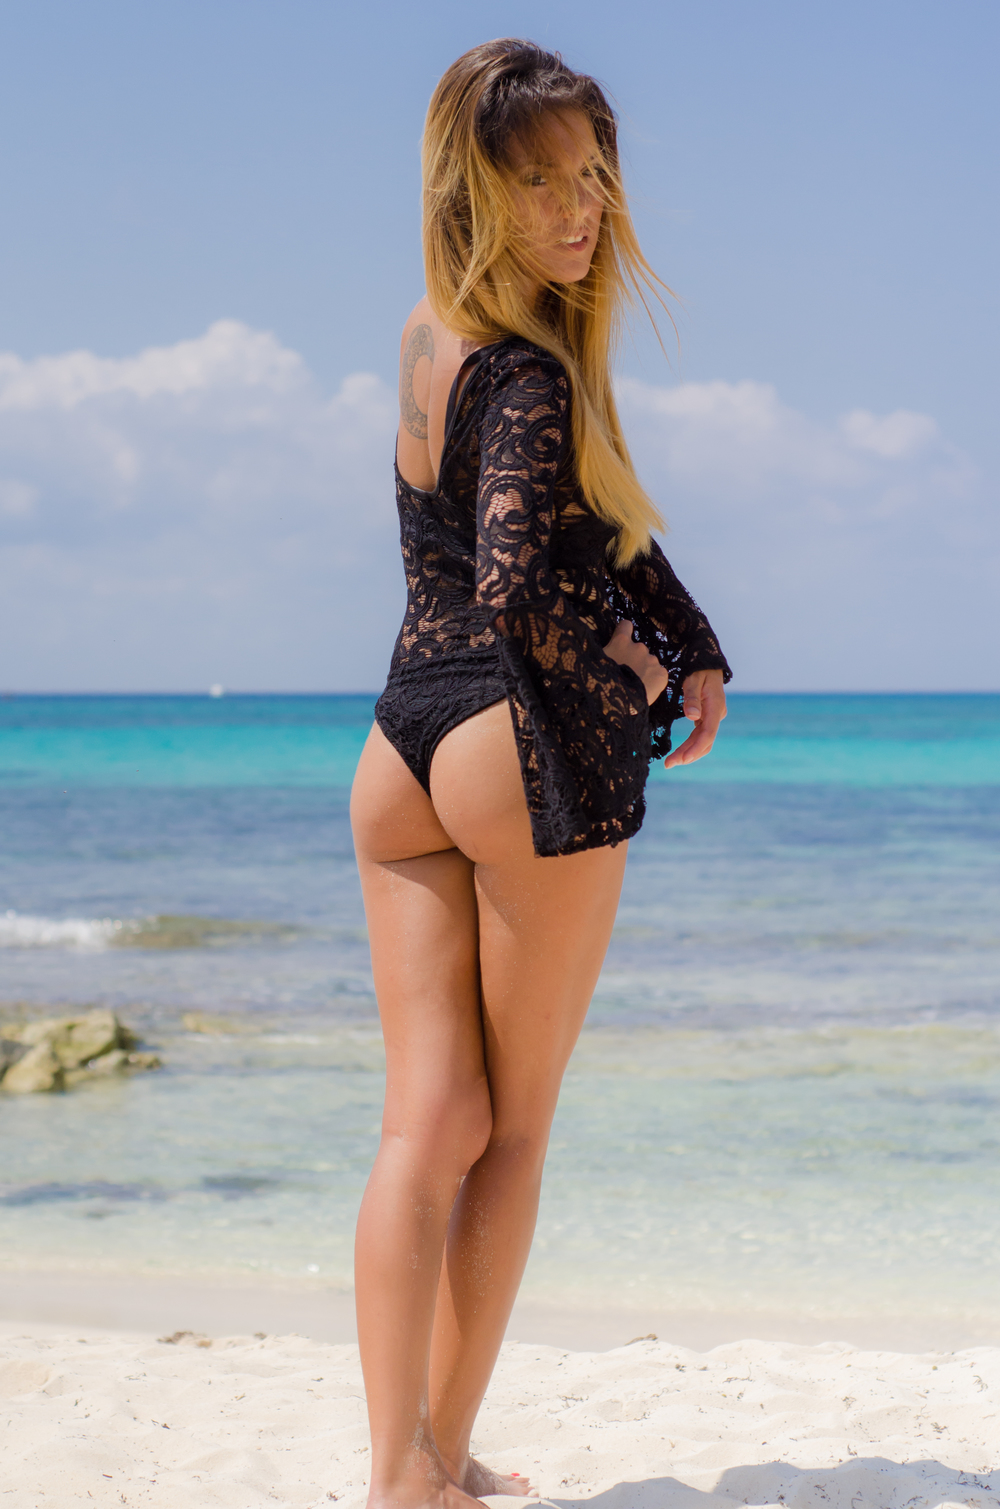 Lifestyleemmanuel Diaz July 26 2016 Playa Del Carmen Photographer Beauty Latina Blonde Caribbean Ass Lifestyle Swimwear Photographer